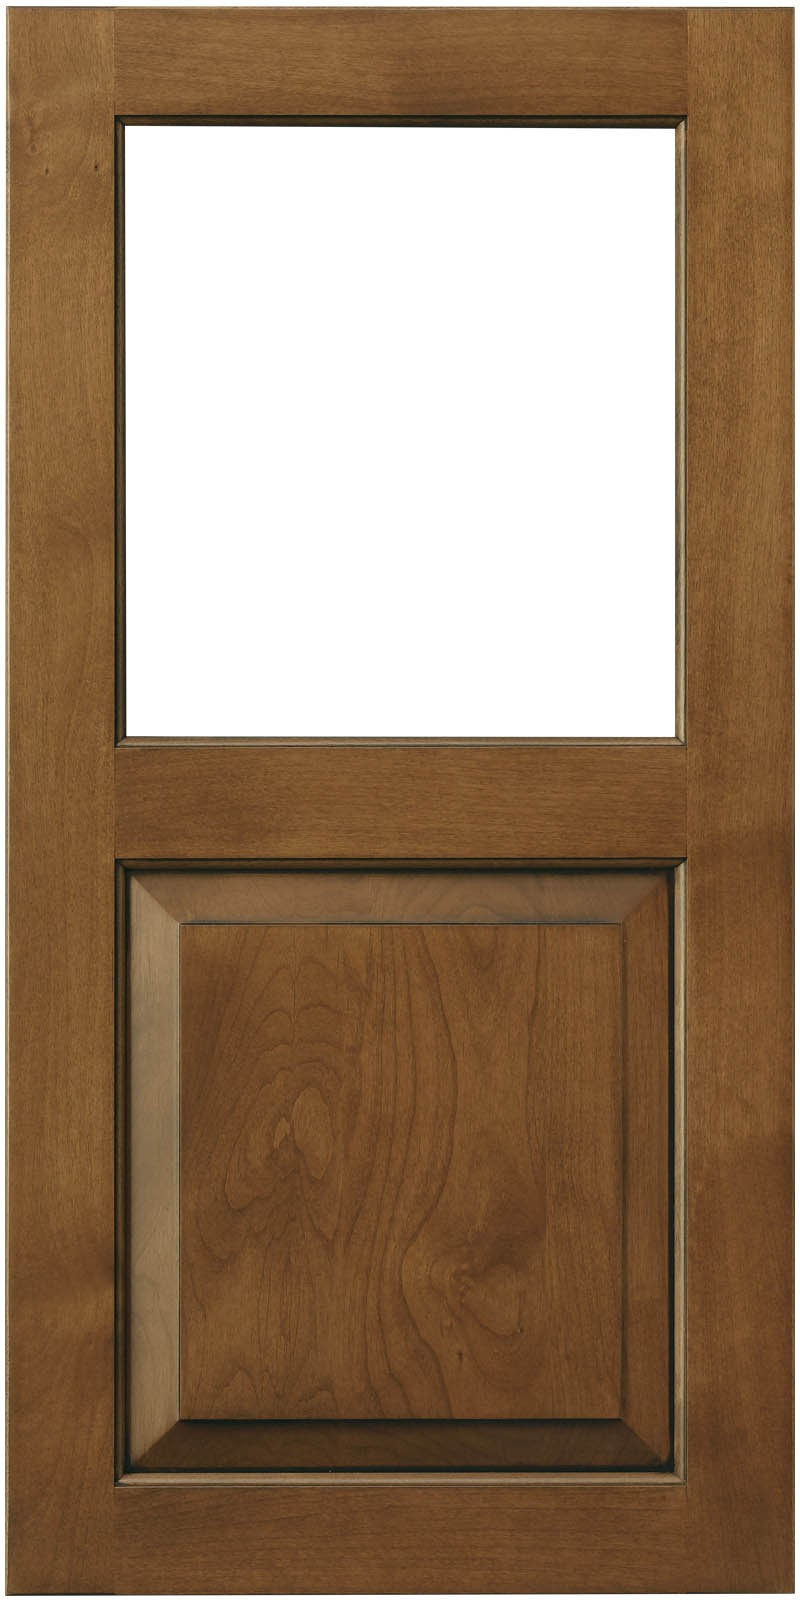 Frame Only Combi Mullion Doors Construction